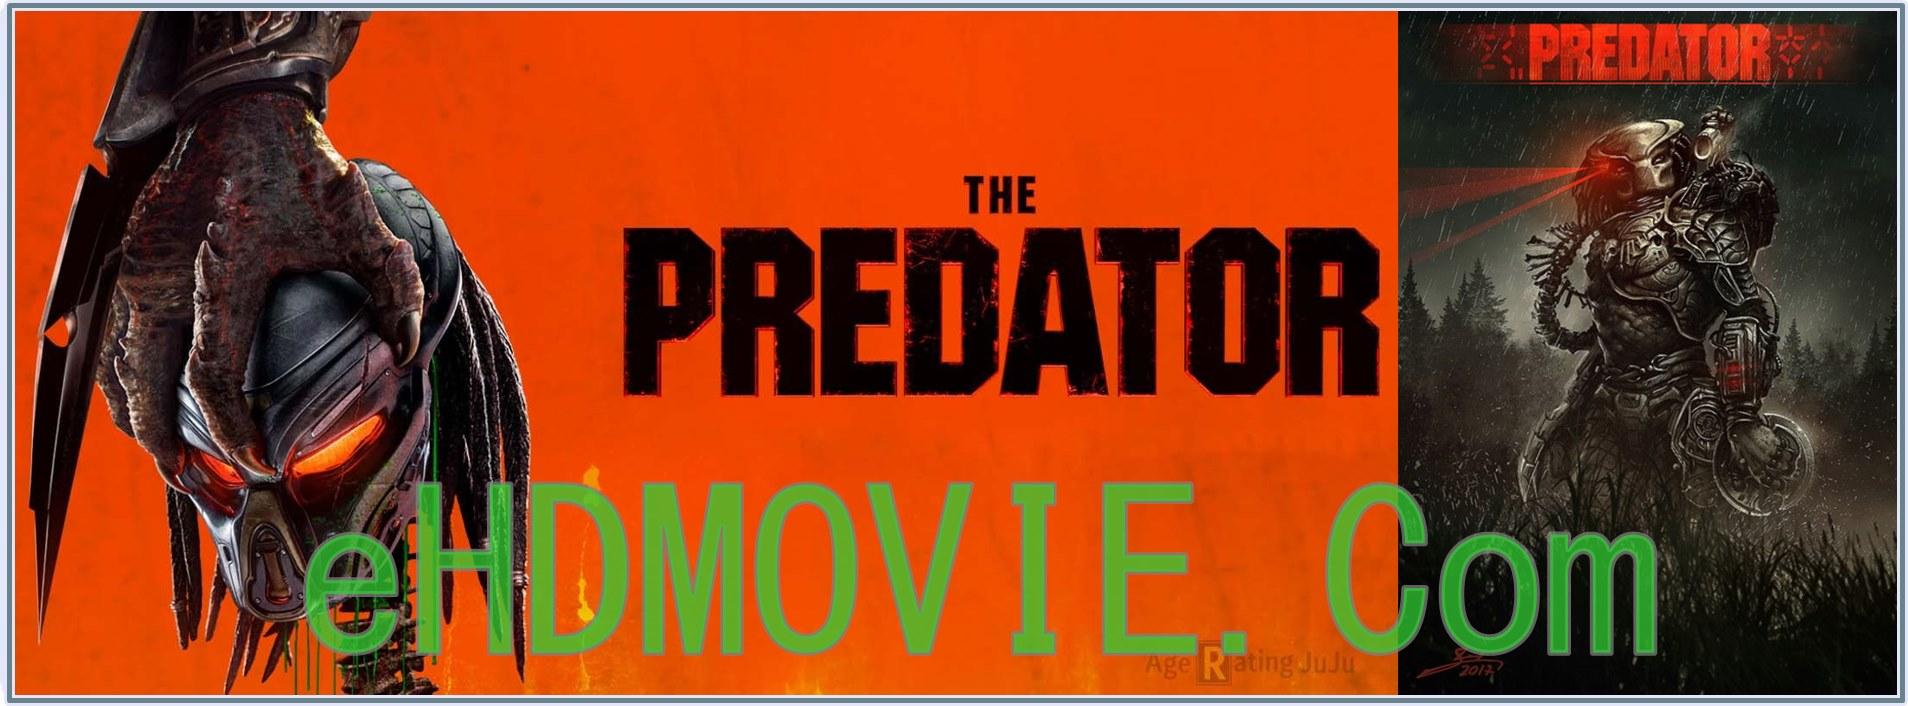 The Predator 2018 Full Movie Dual Audio [Hindi – English] 1080p - 720p - HEVC - 480p ORG Blu-Ray 350MB - 550MB - 1GB - 3.4GB ESubs Free Download